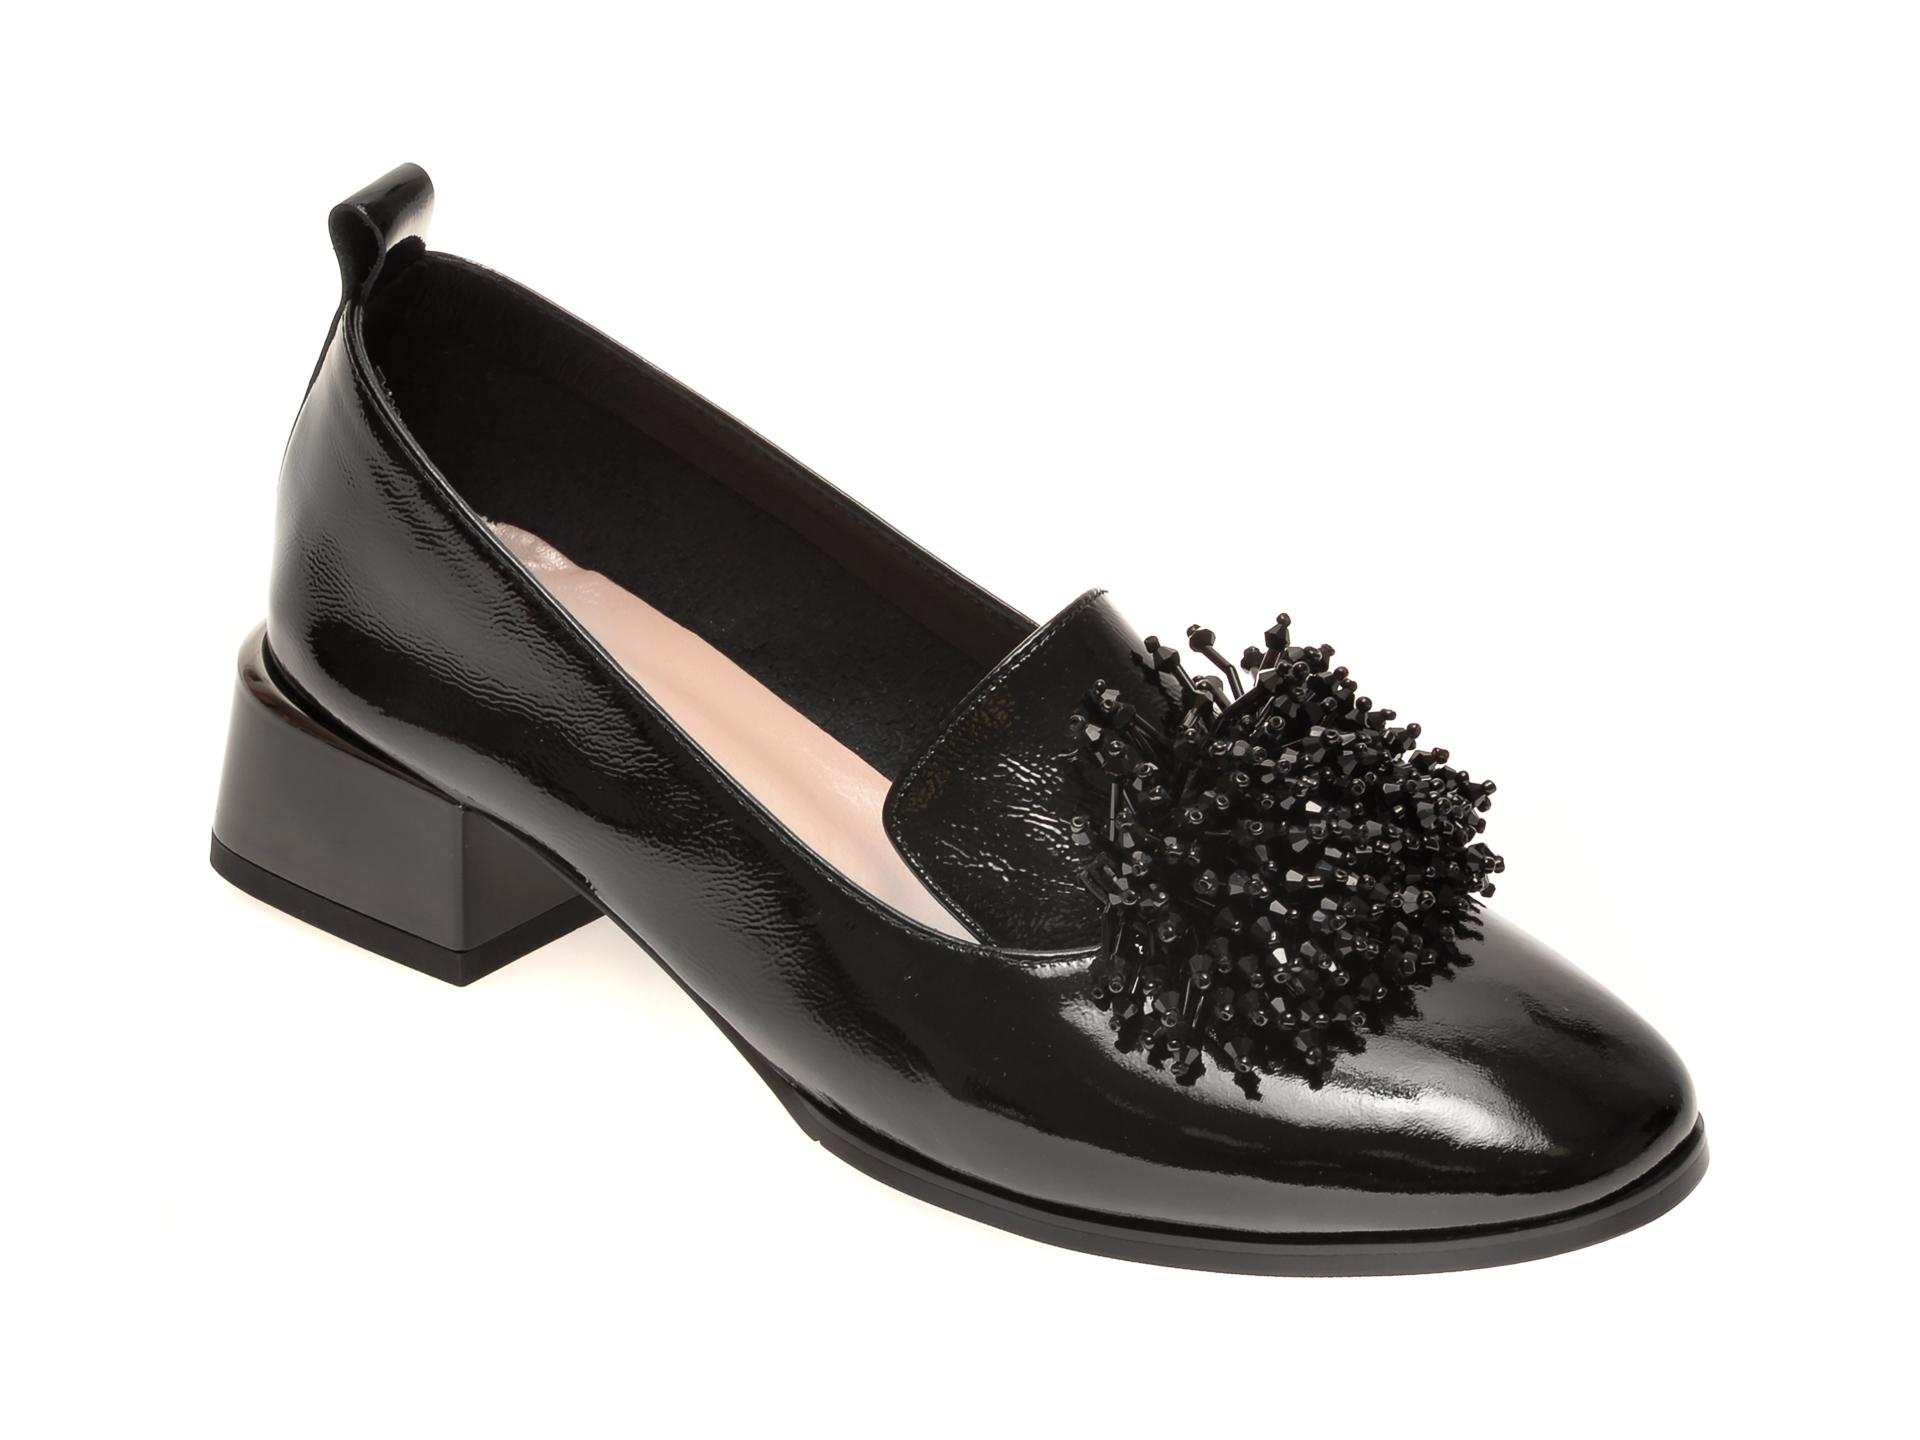 Pantofi EPICA negri, 3750, din piele naturala lacuita